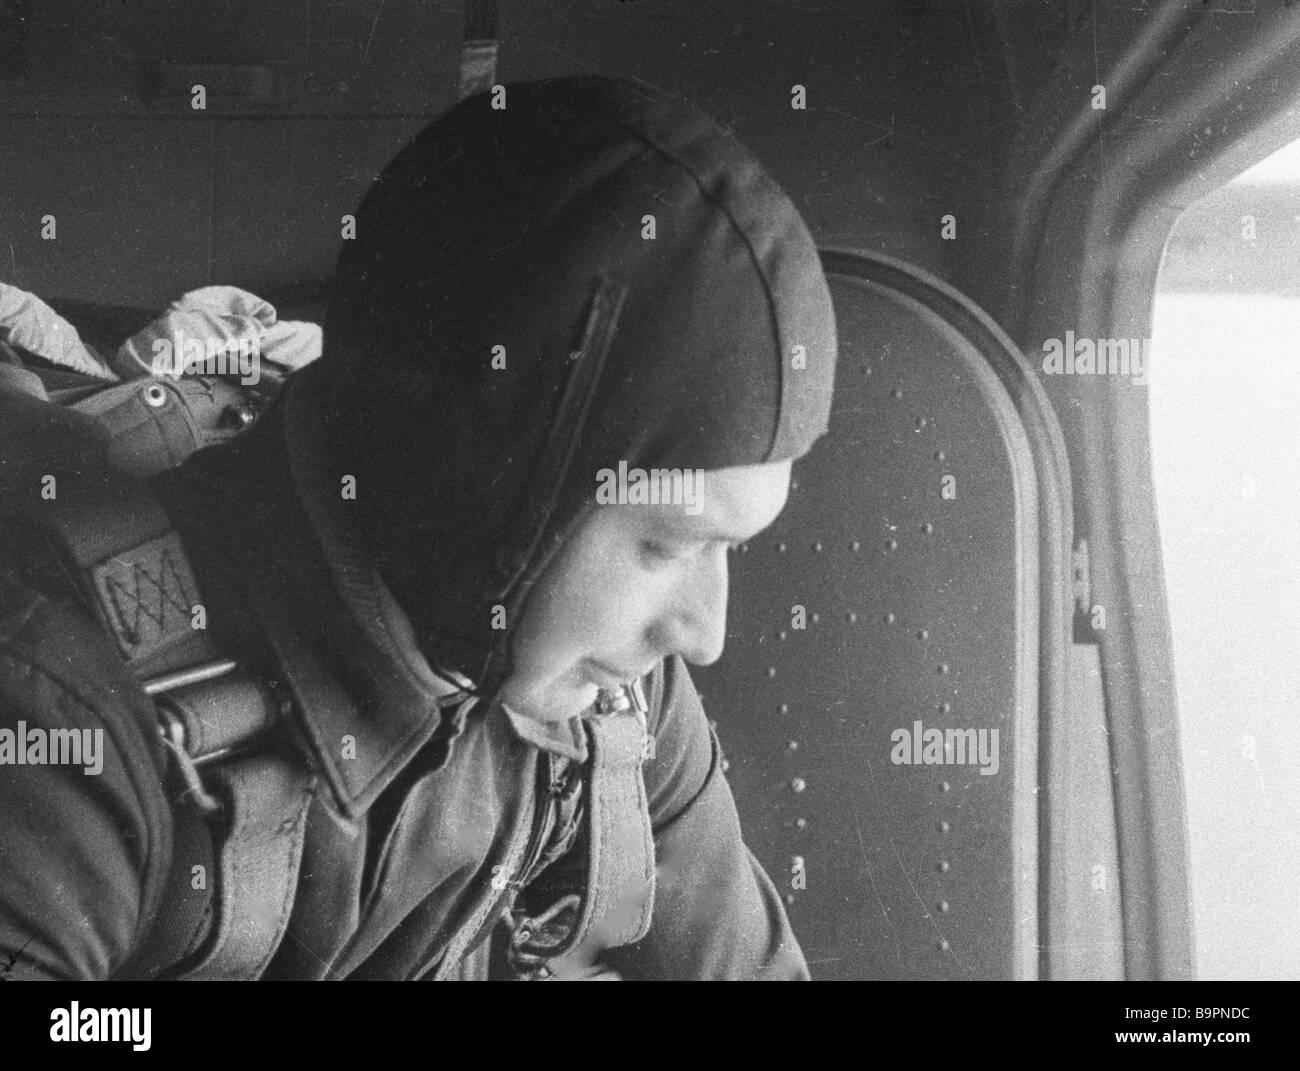 Cosmonaut Boris Yegorov preparing to bail out - Stock Image